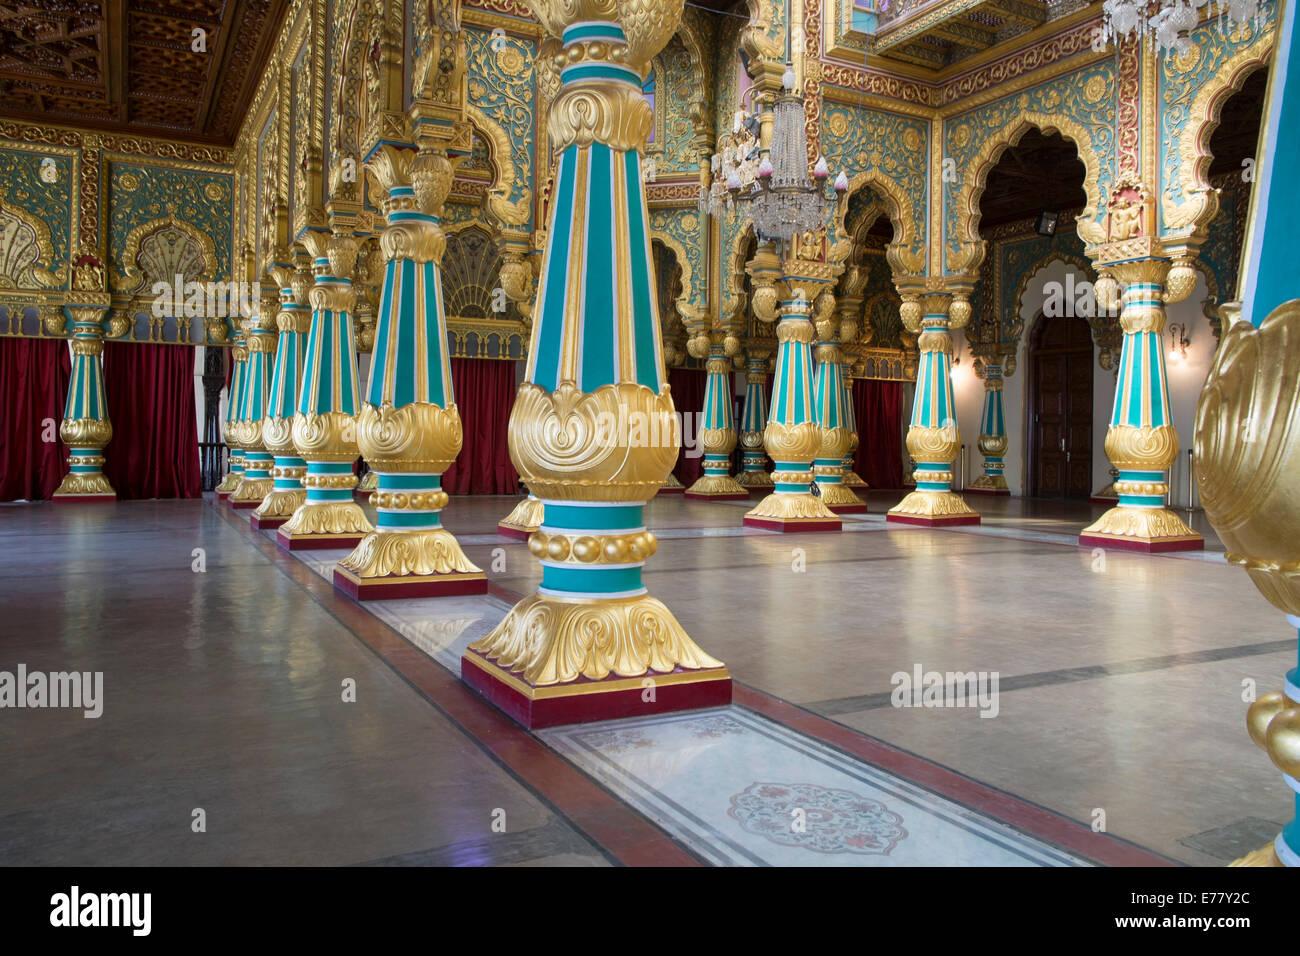 Columned Hall In The Mysore Palace, Mysore, Karnataka, India   Stock Image